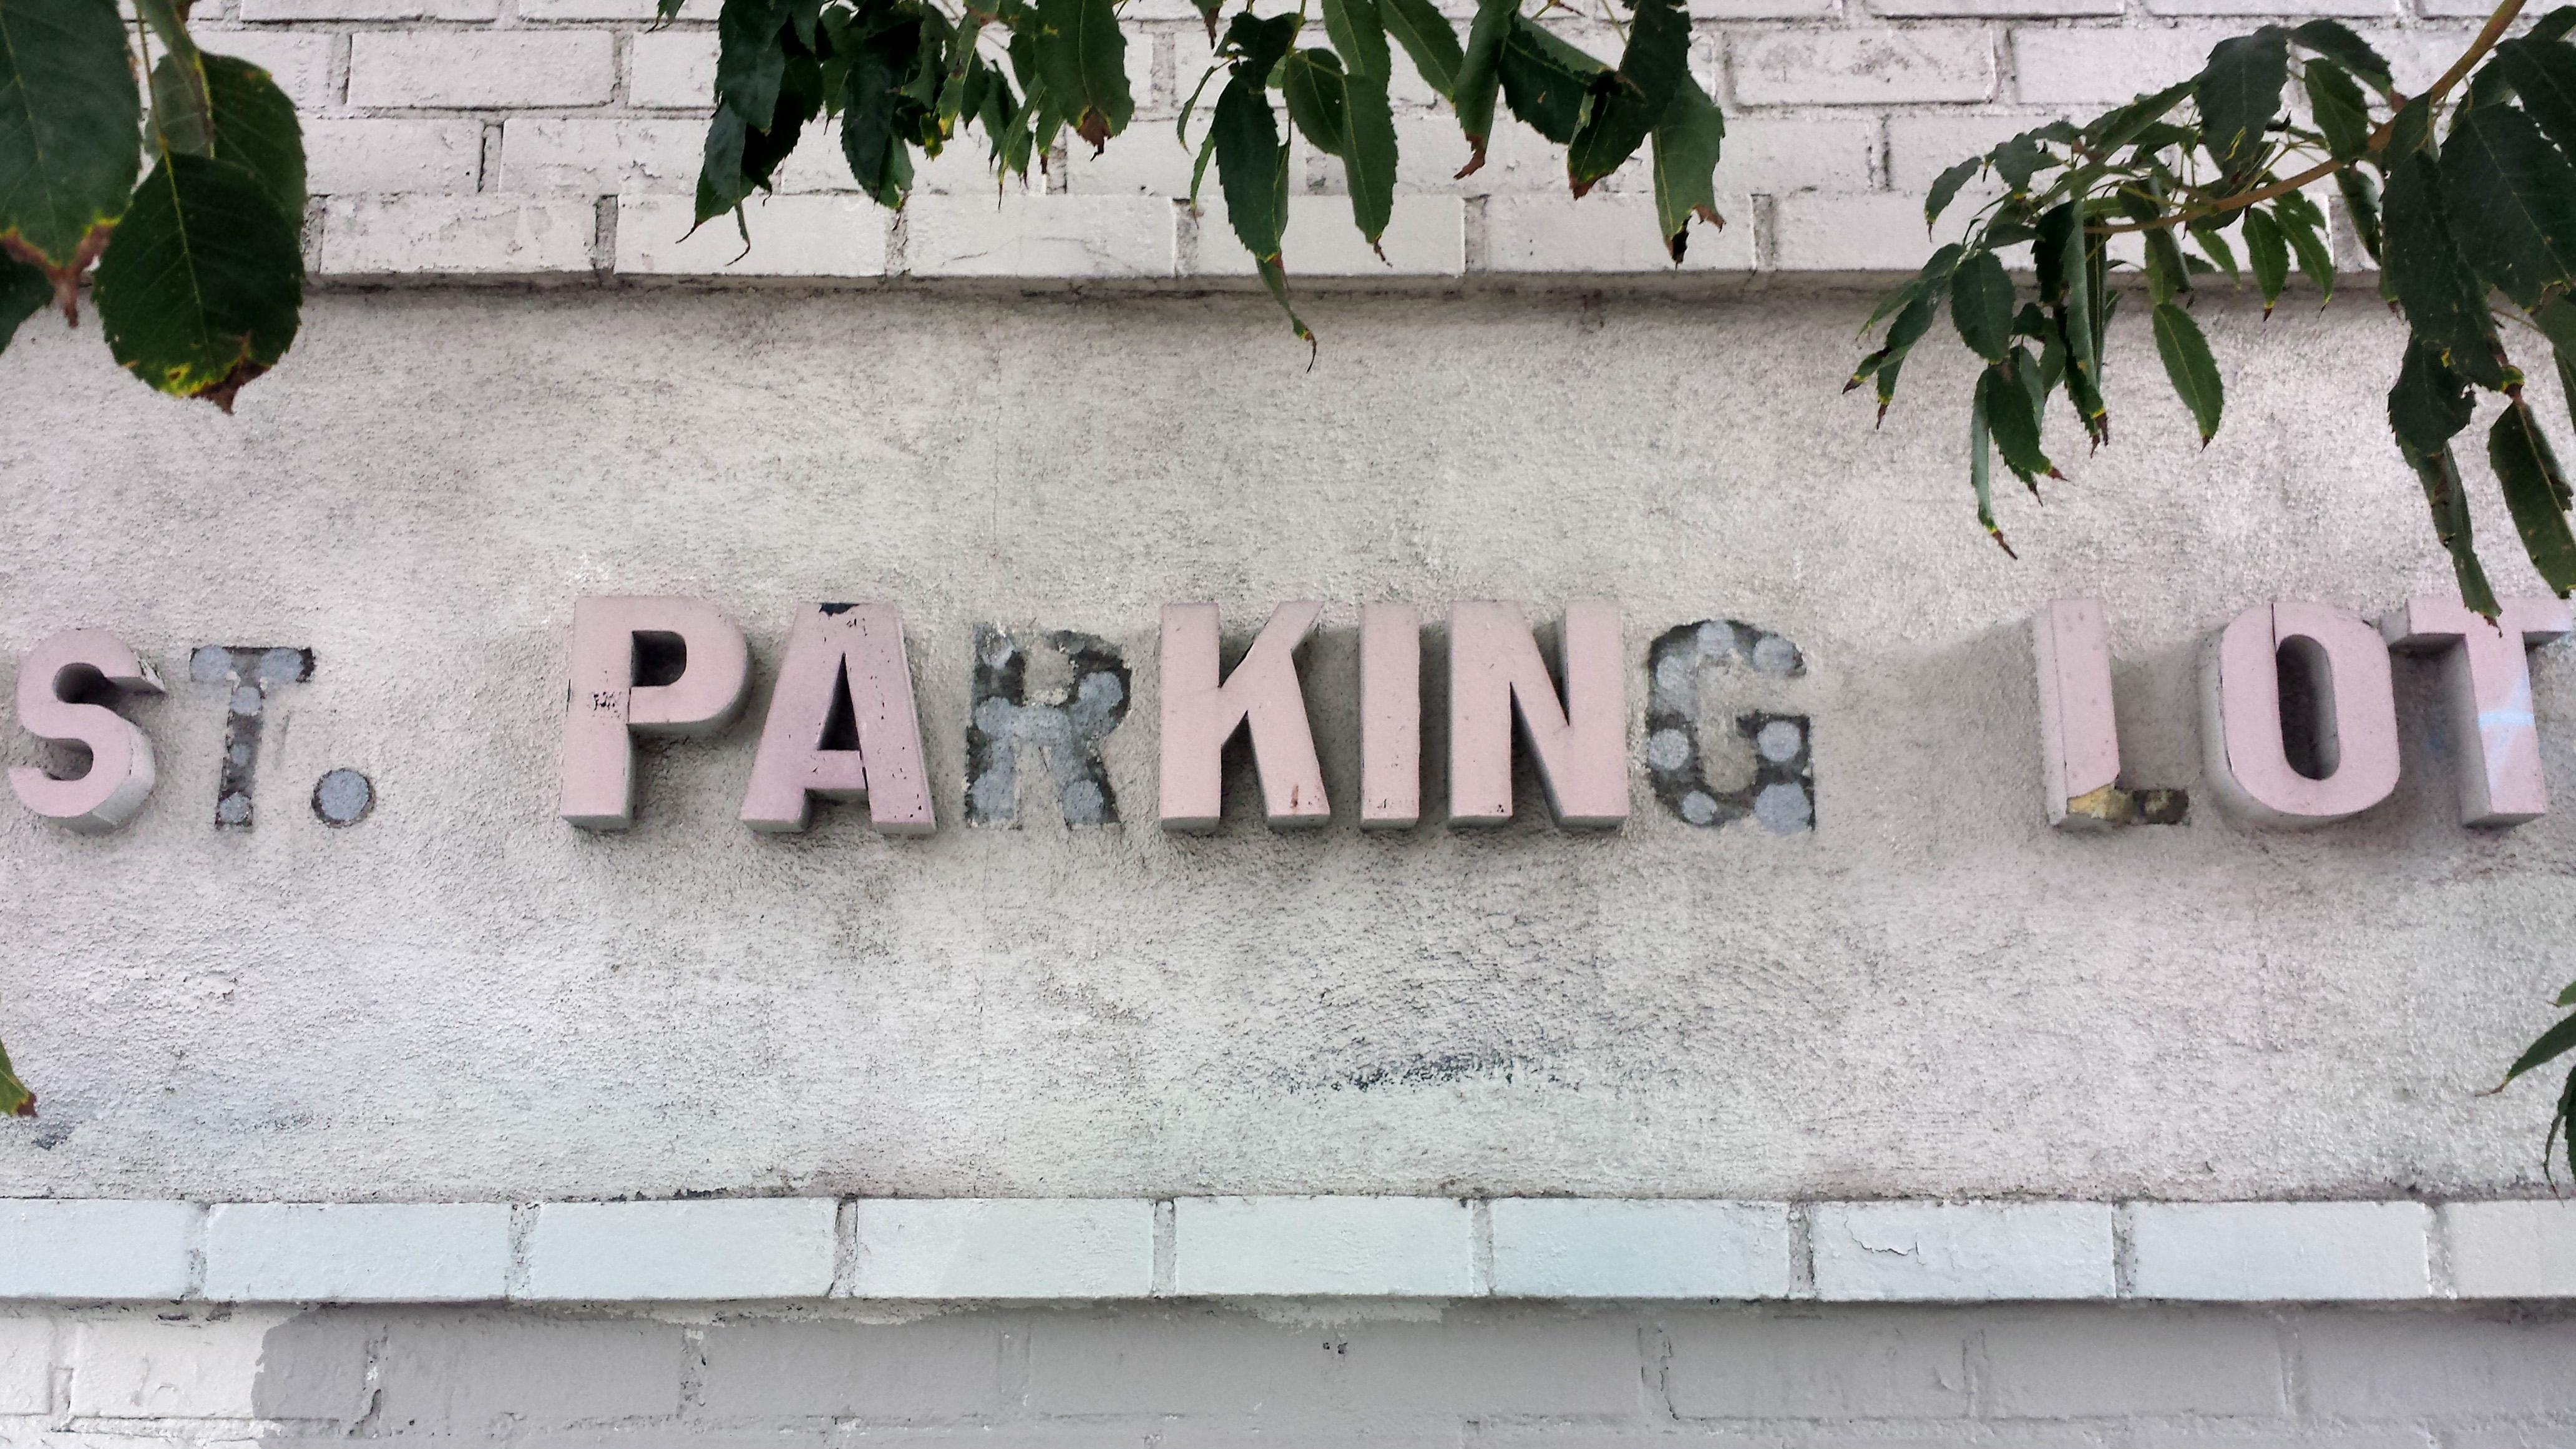 20171101_144526. Pink Parking Sign